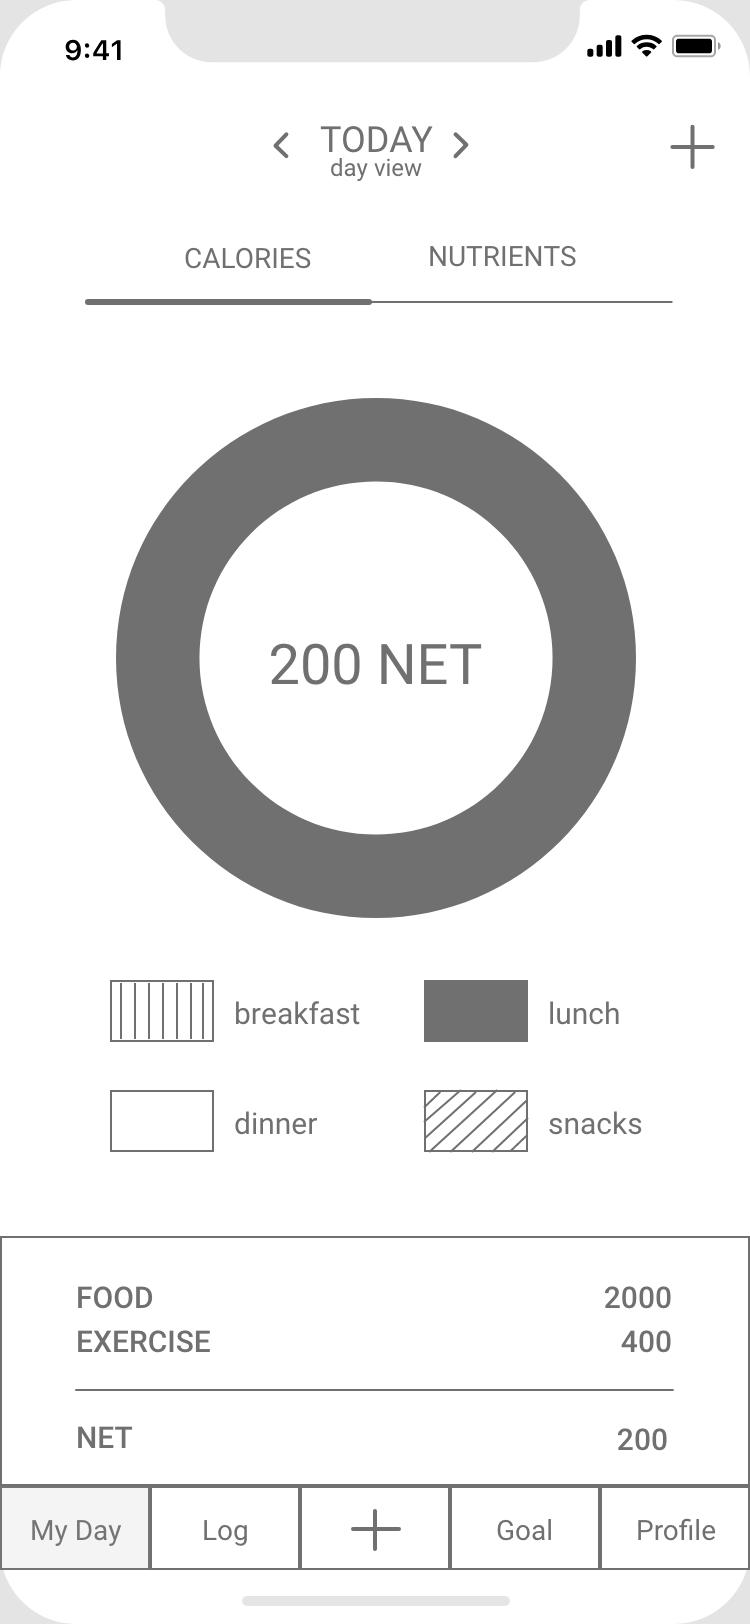 caloric breakdown@2x.png